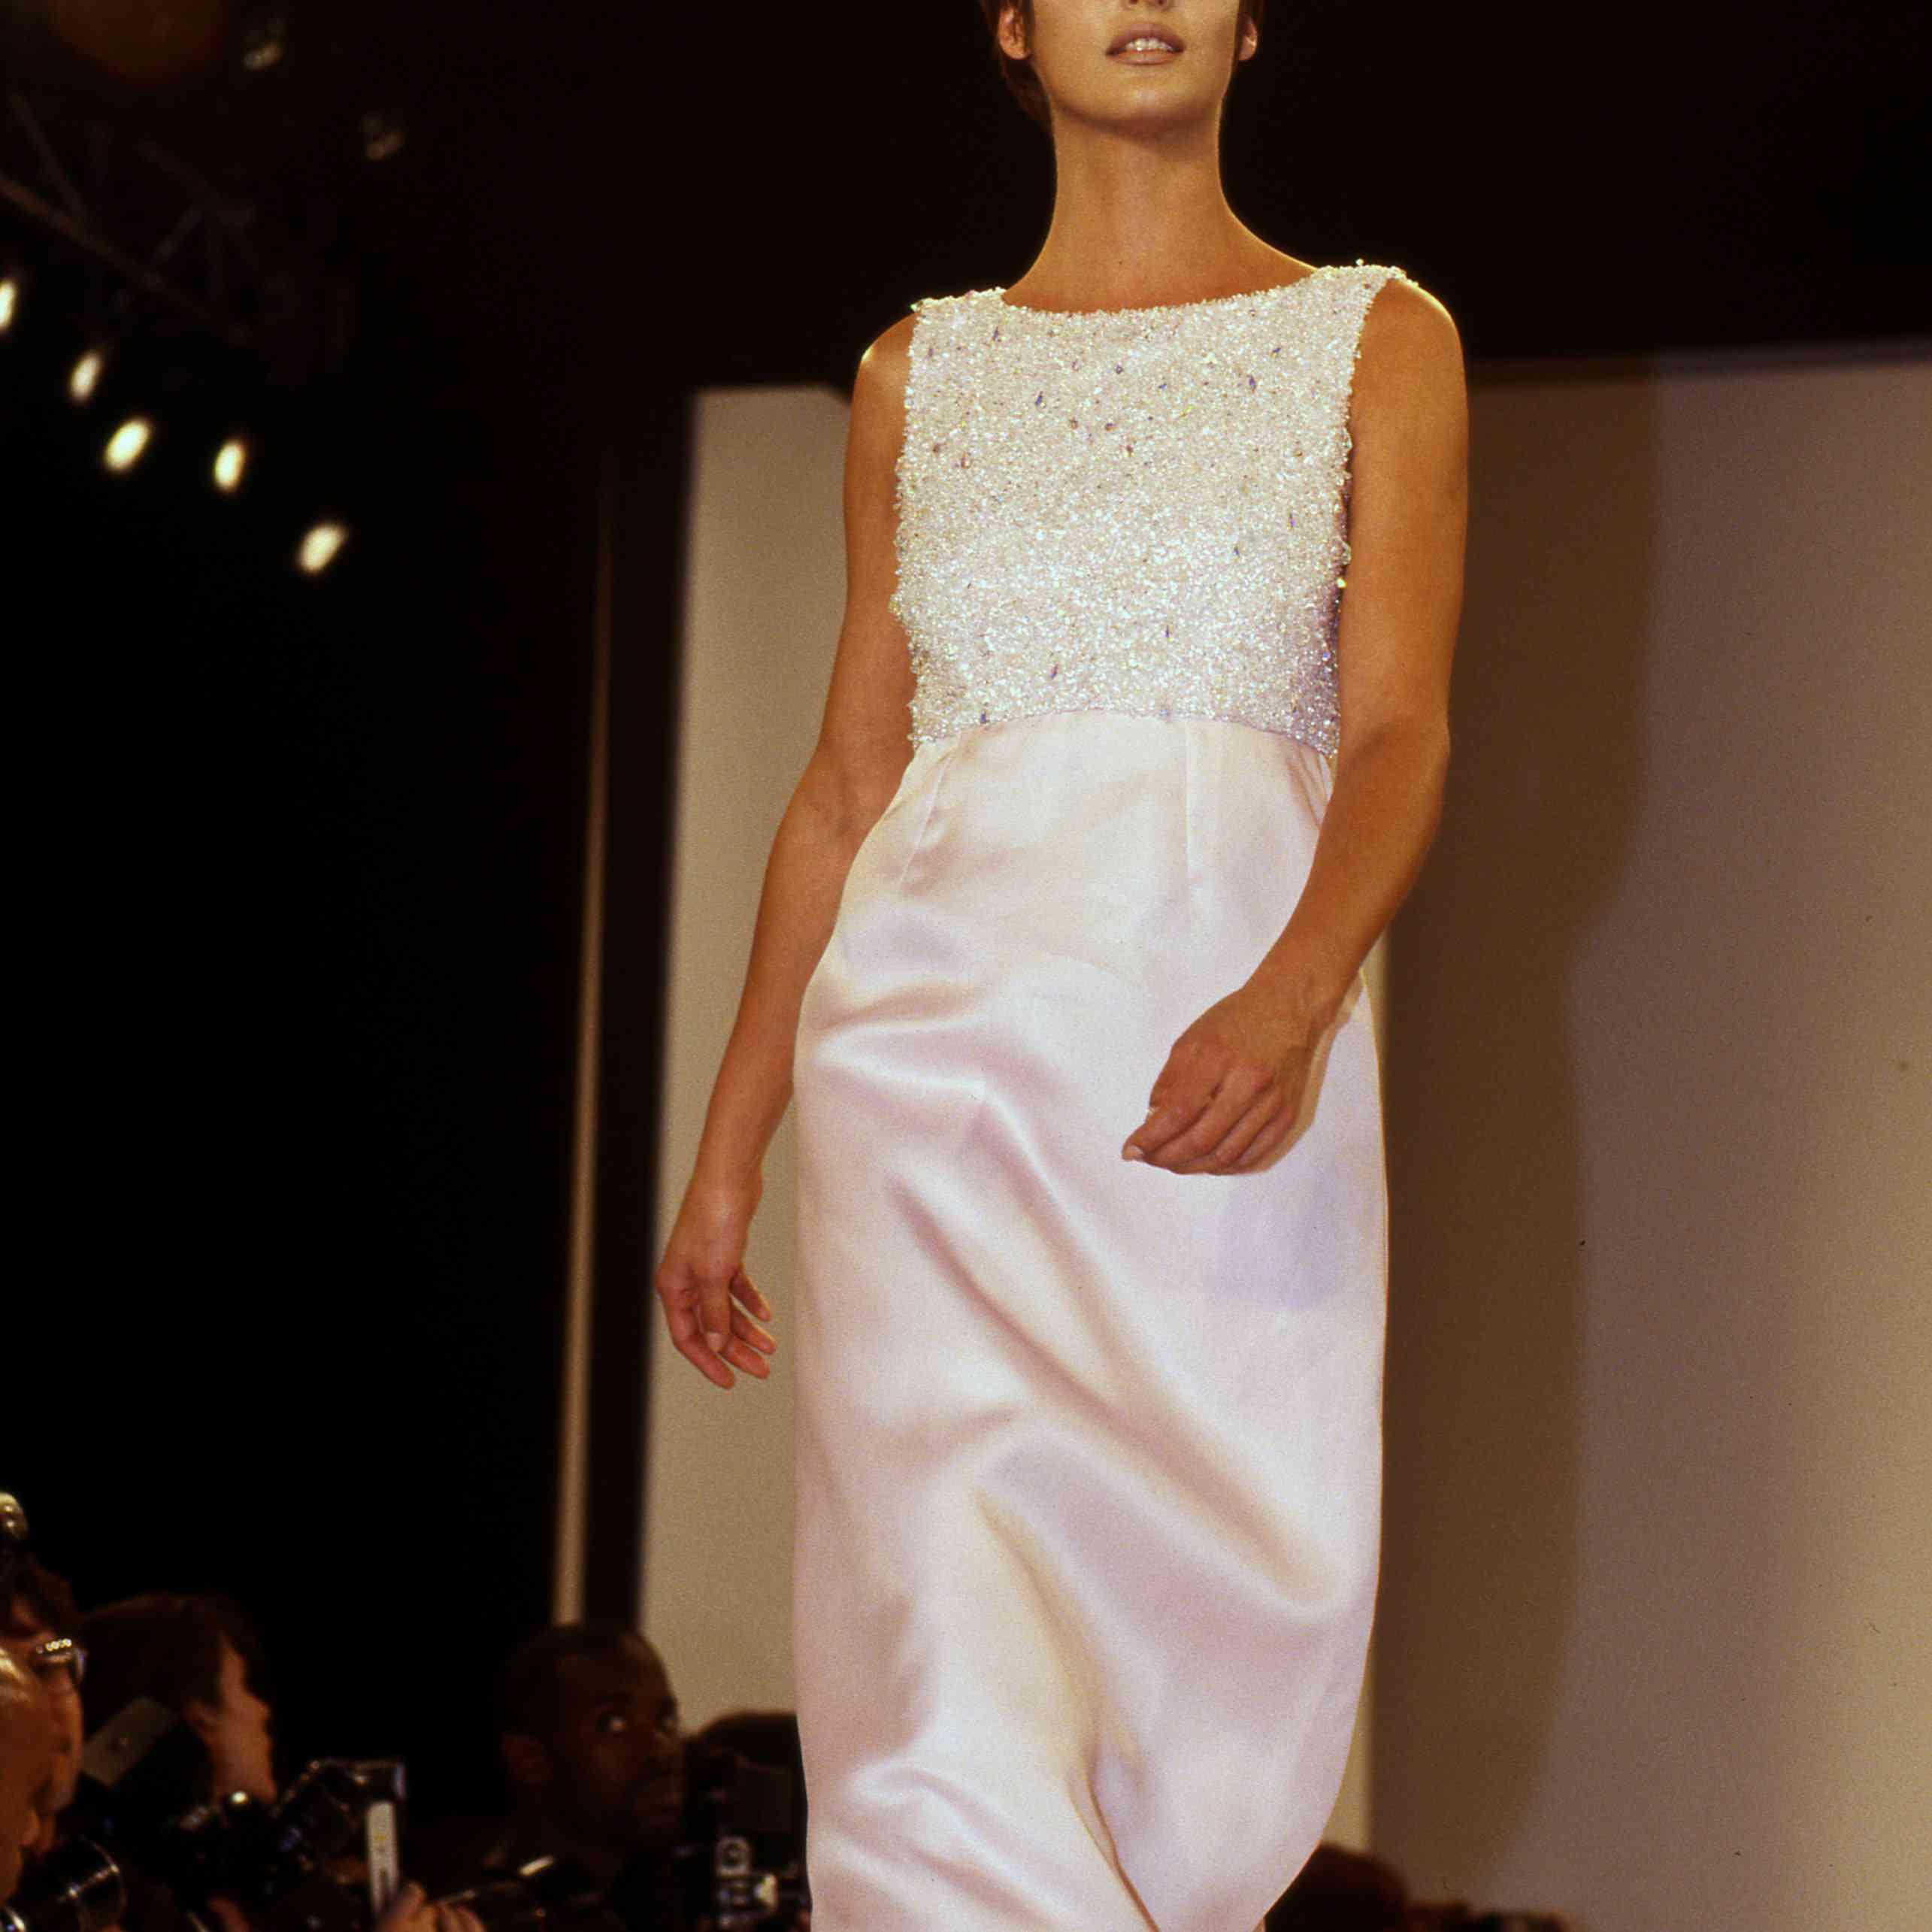 Supermodel Linda Evangelista walks the runway at an Isaac Mizrahi fashion show on November 2, 1995 in New York City, New York.